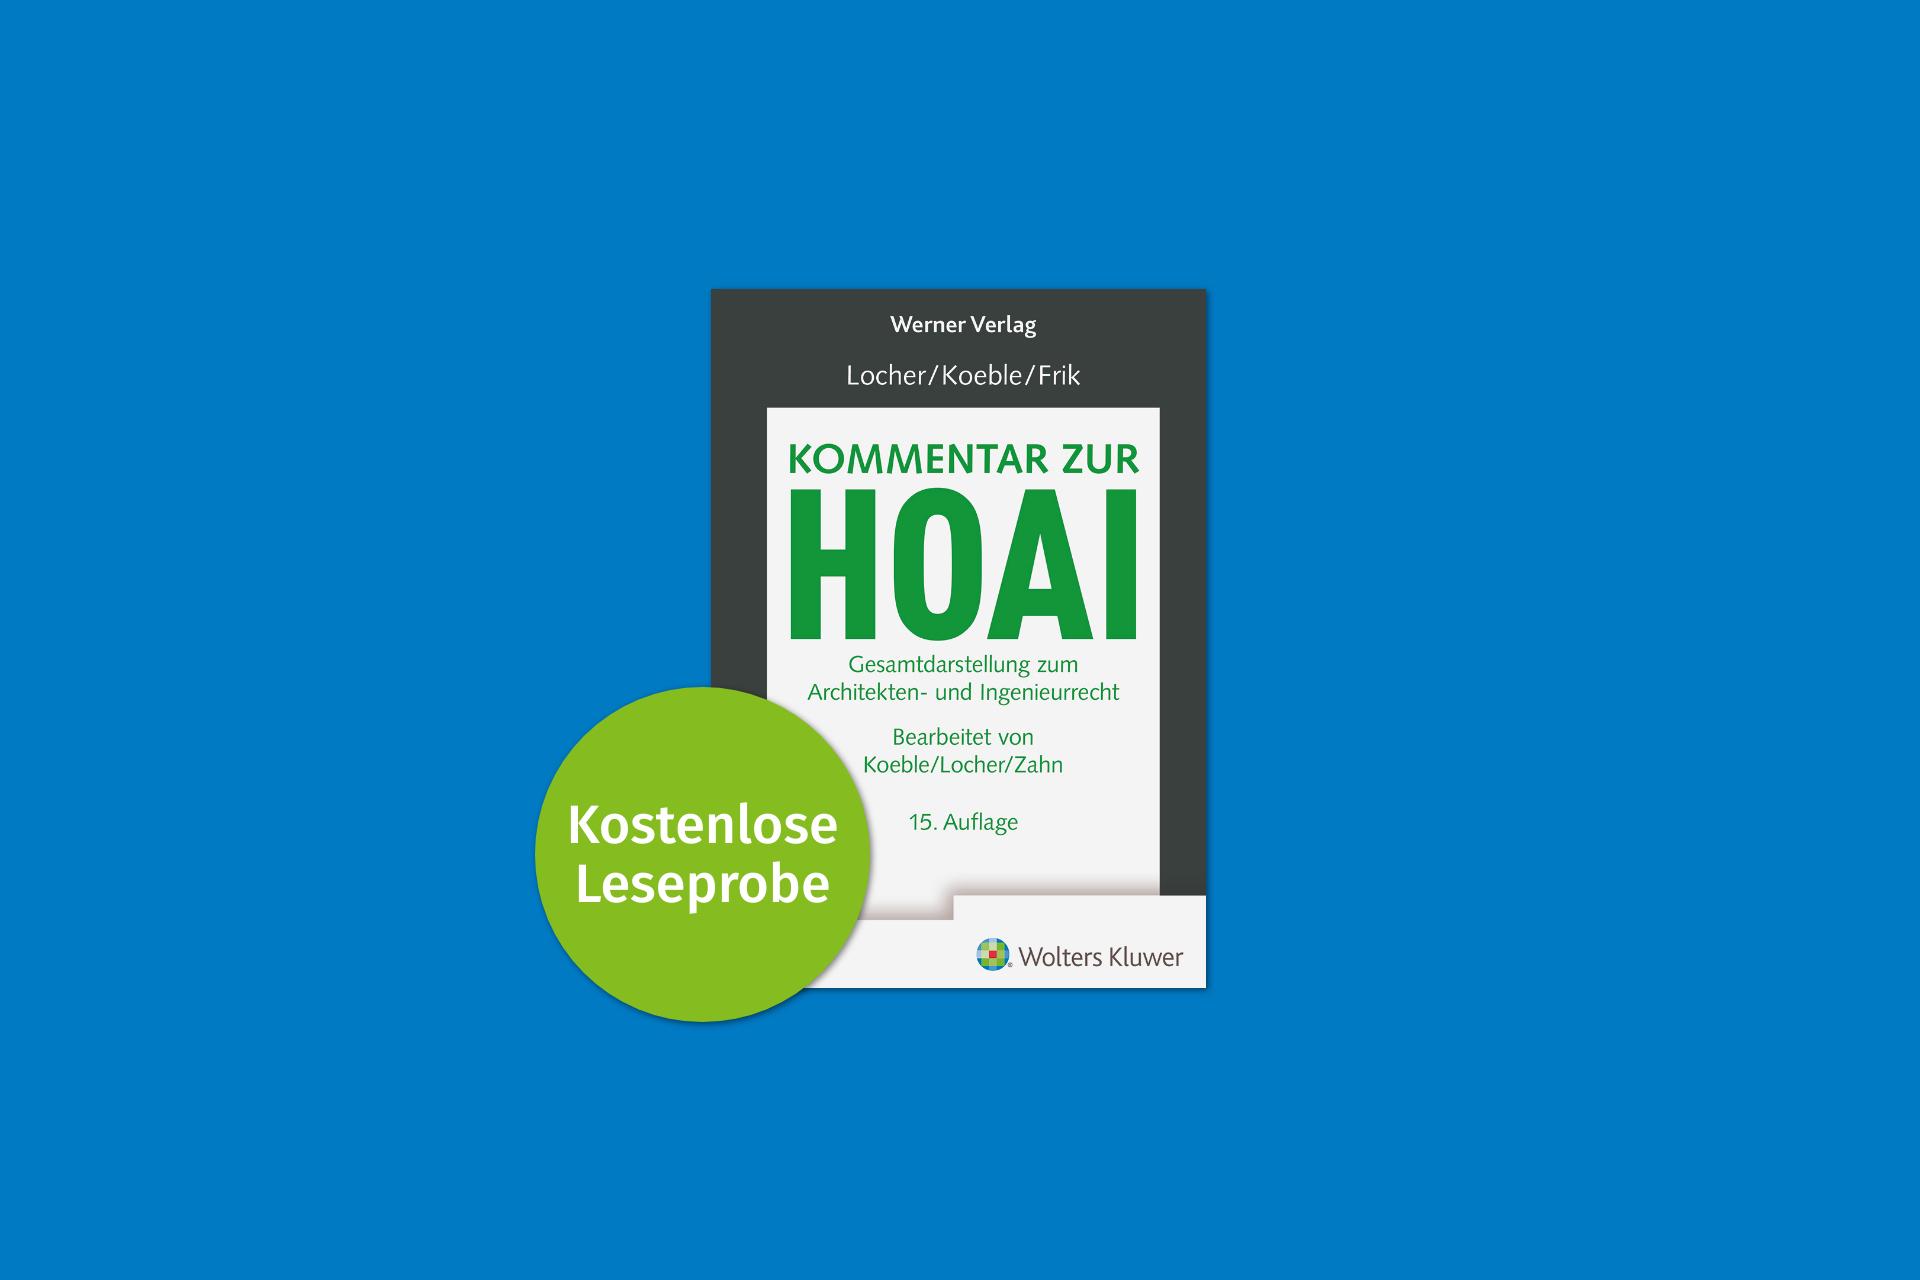 HOAI-Kommentar-OneWeb-1920x1280-3